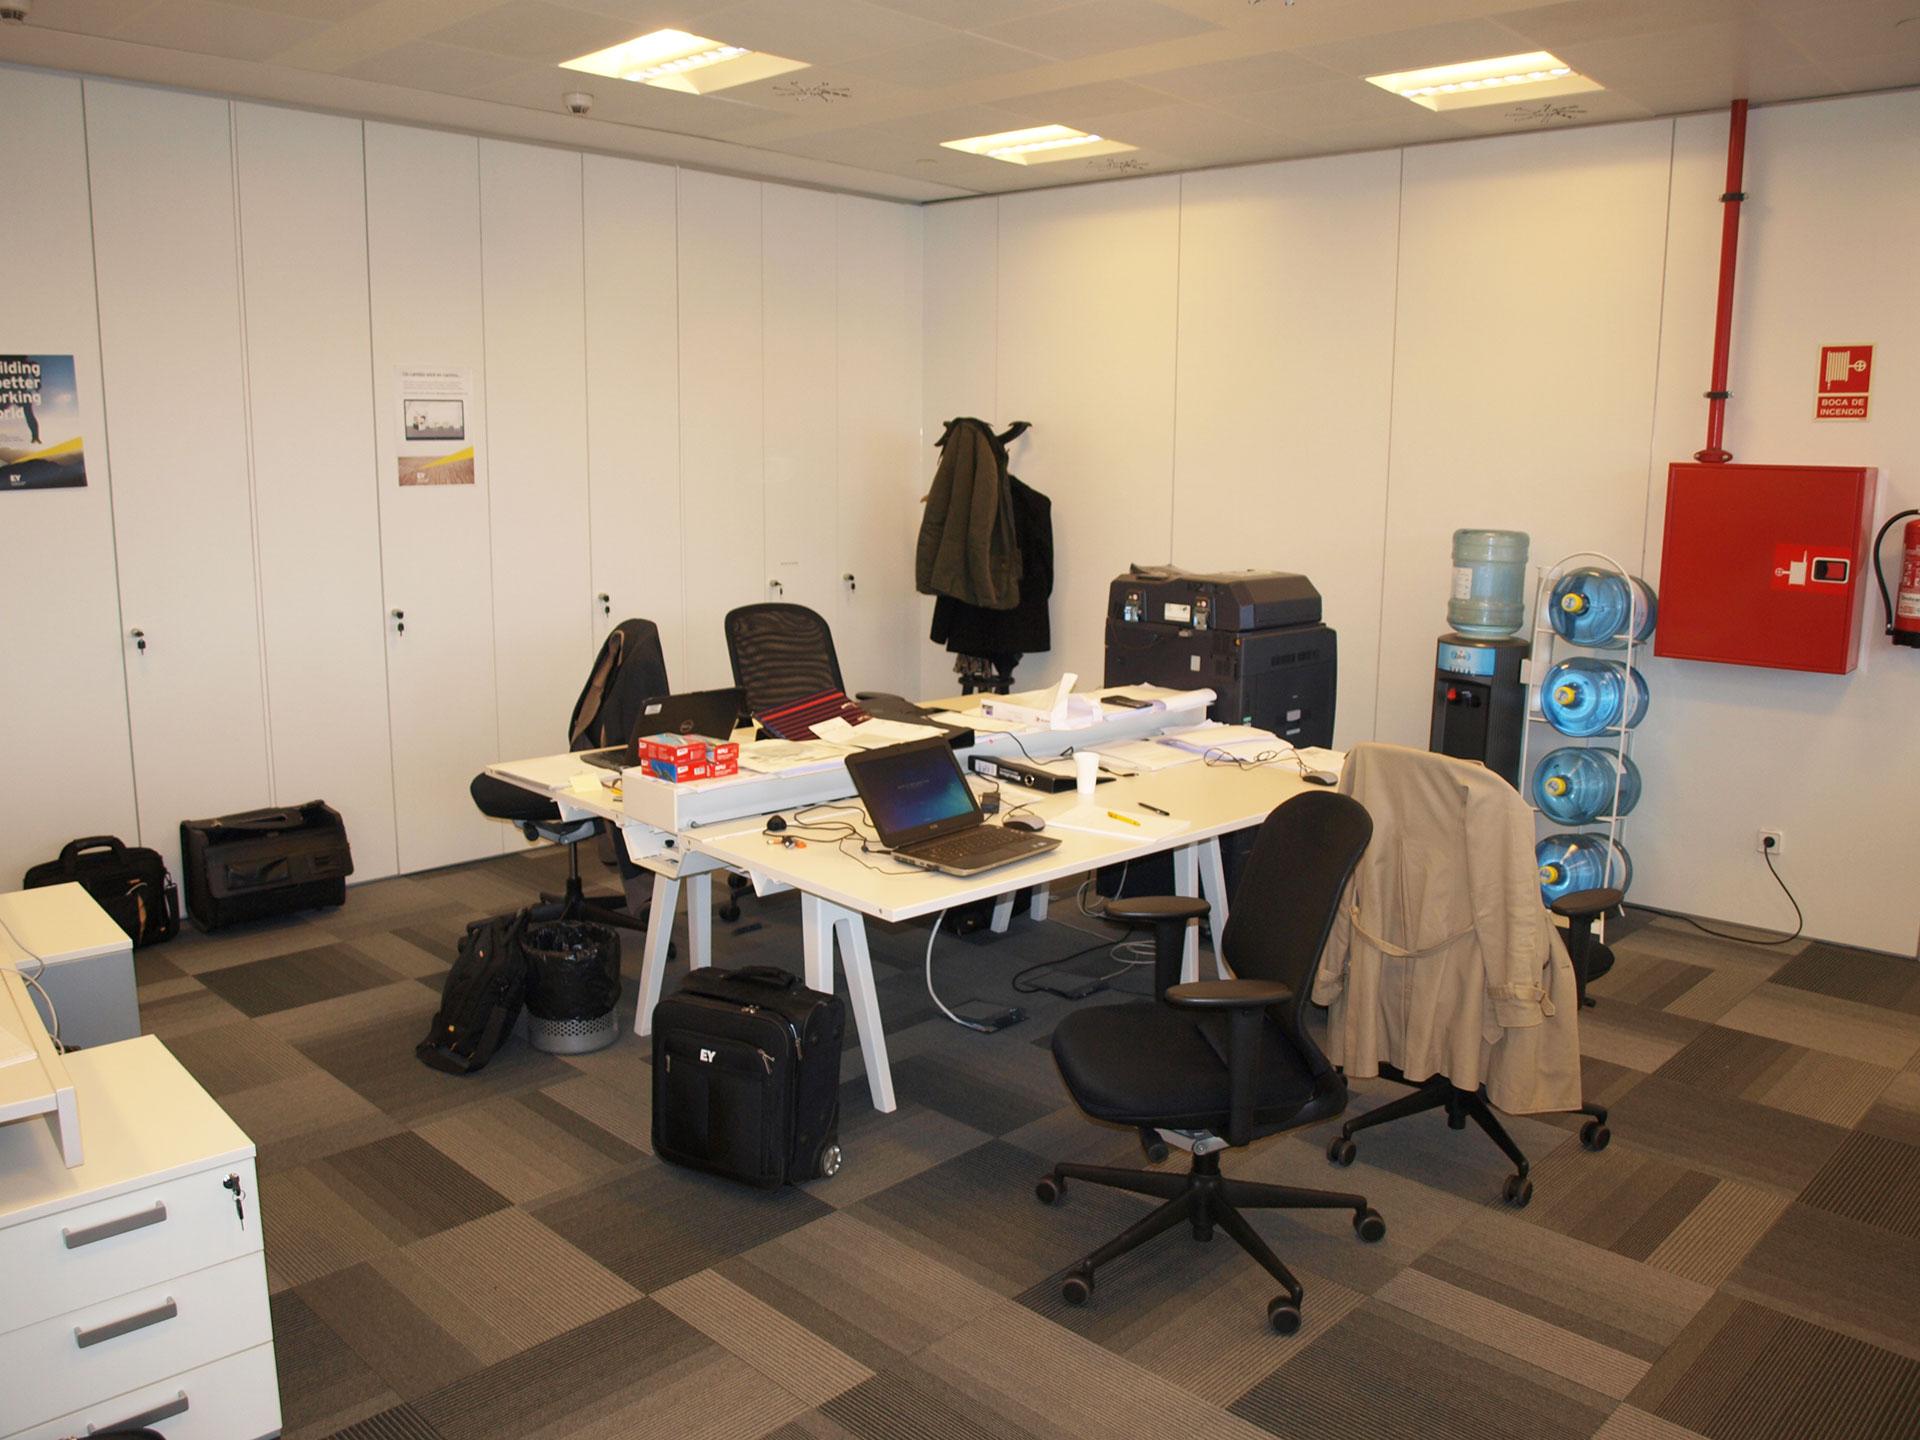 Ey torre iberdrola bilbao oficinas construccin for Oficina iberdrola